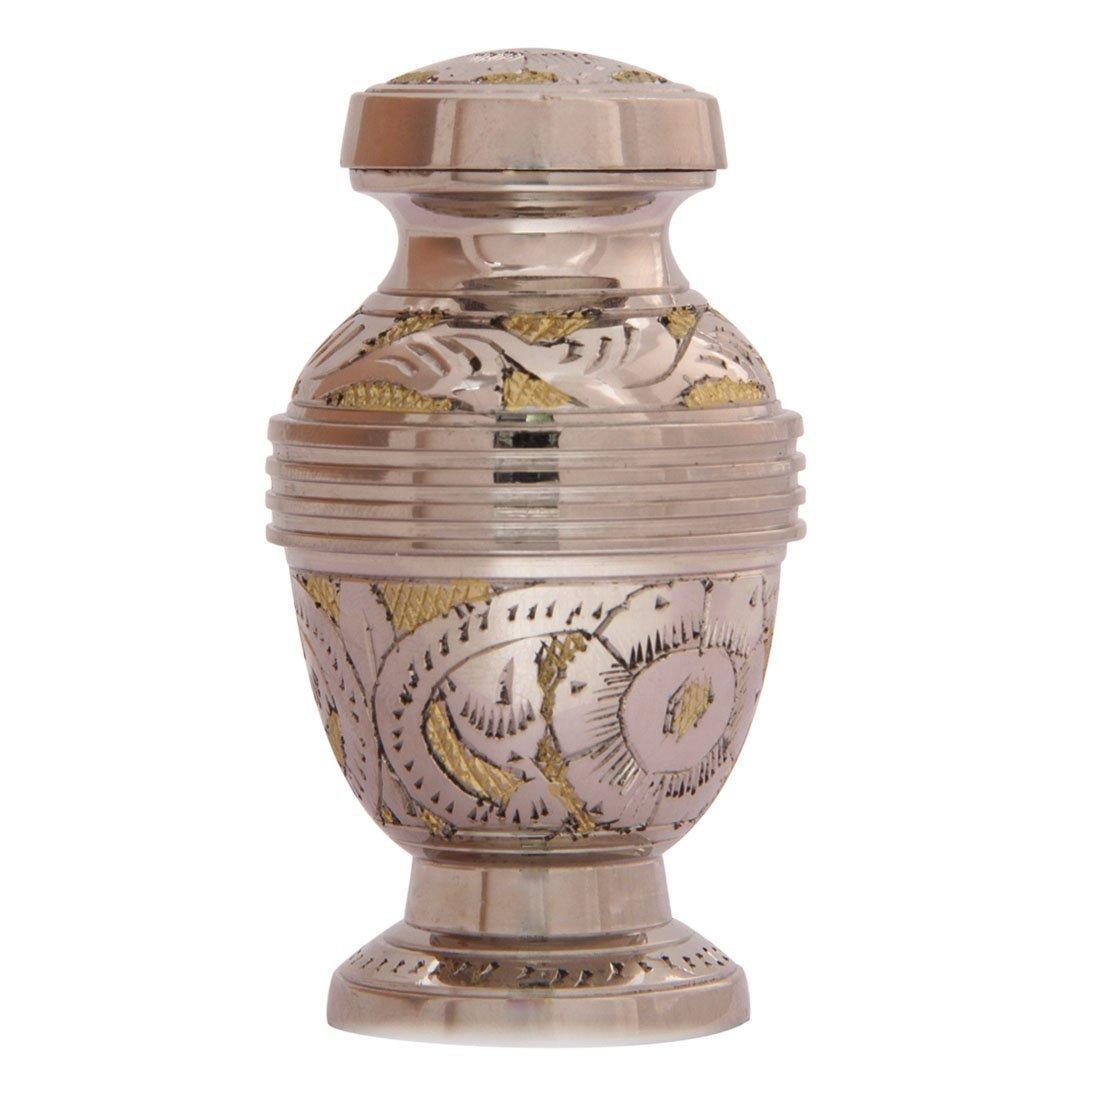 Silver Flower Engraved Golden Keepsake Urn, Small Cremation Urns Ashes